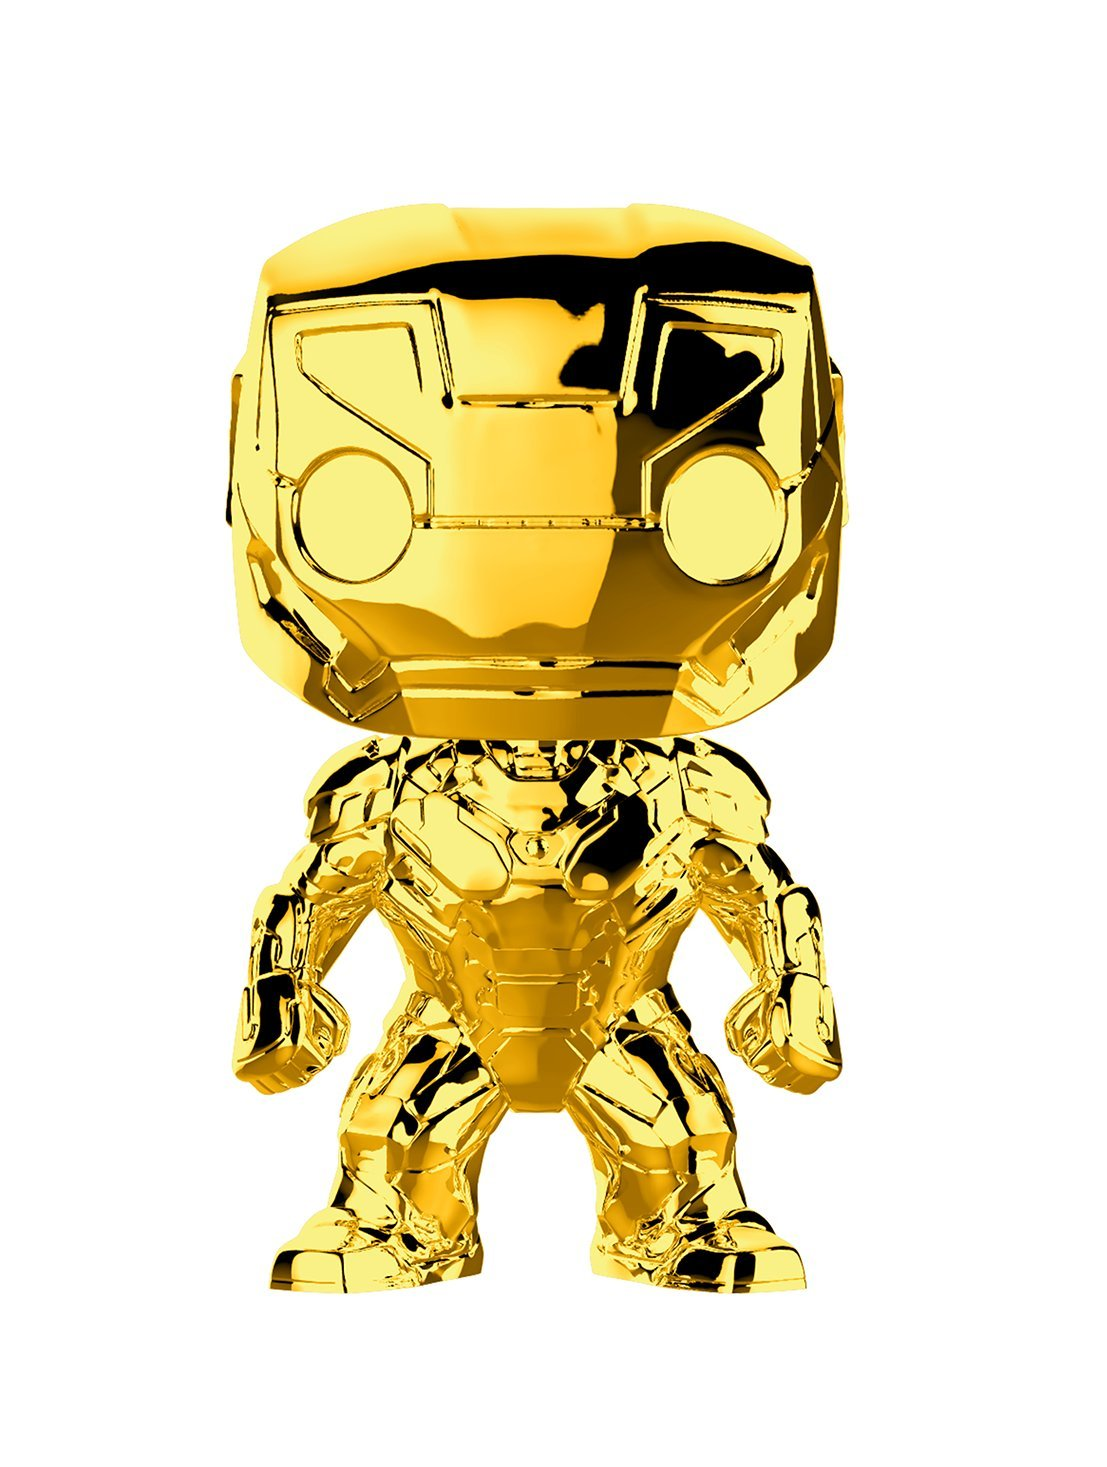 Funko Pop Marvel Studios 10 - Iron Man (Gold Chrome) Collectible Figure, Multicolor by Funko (Image #1)